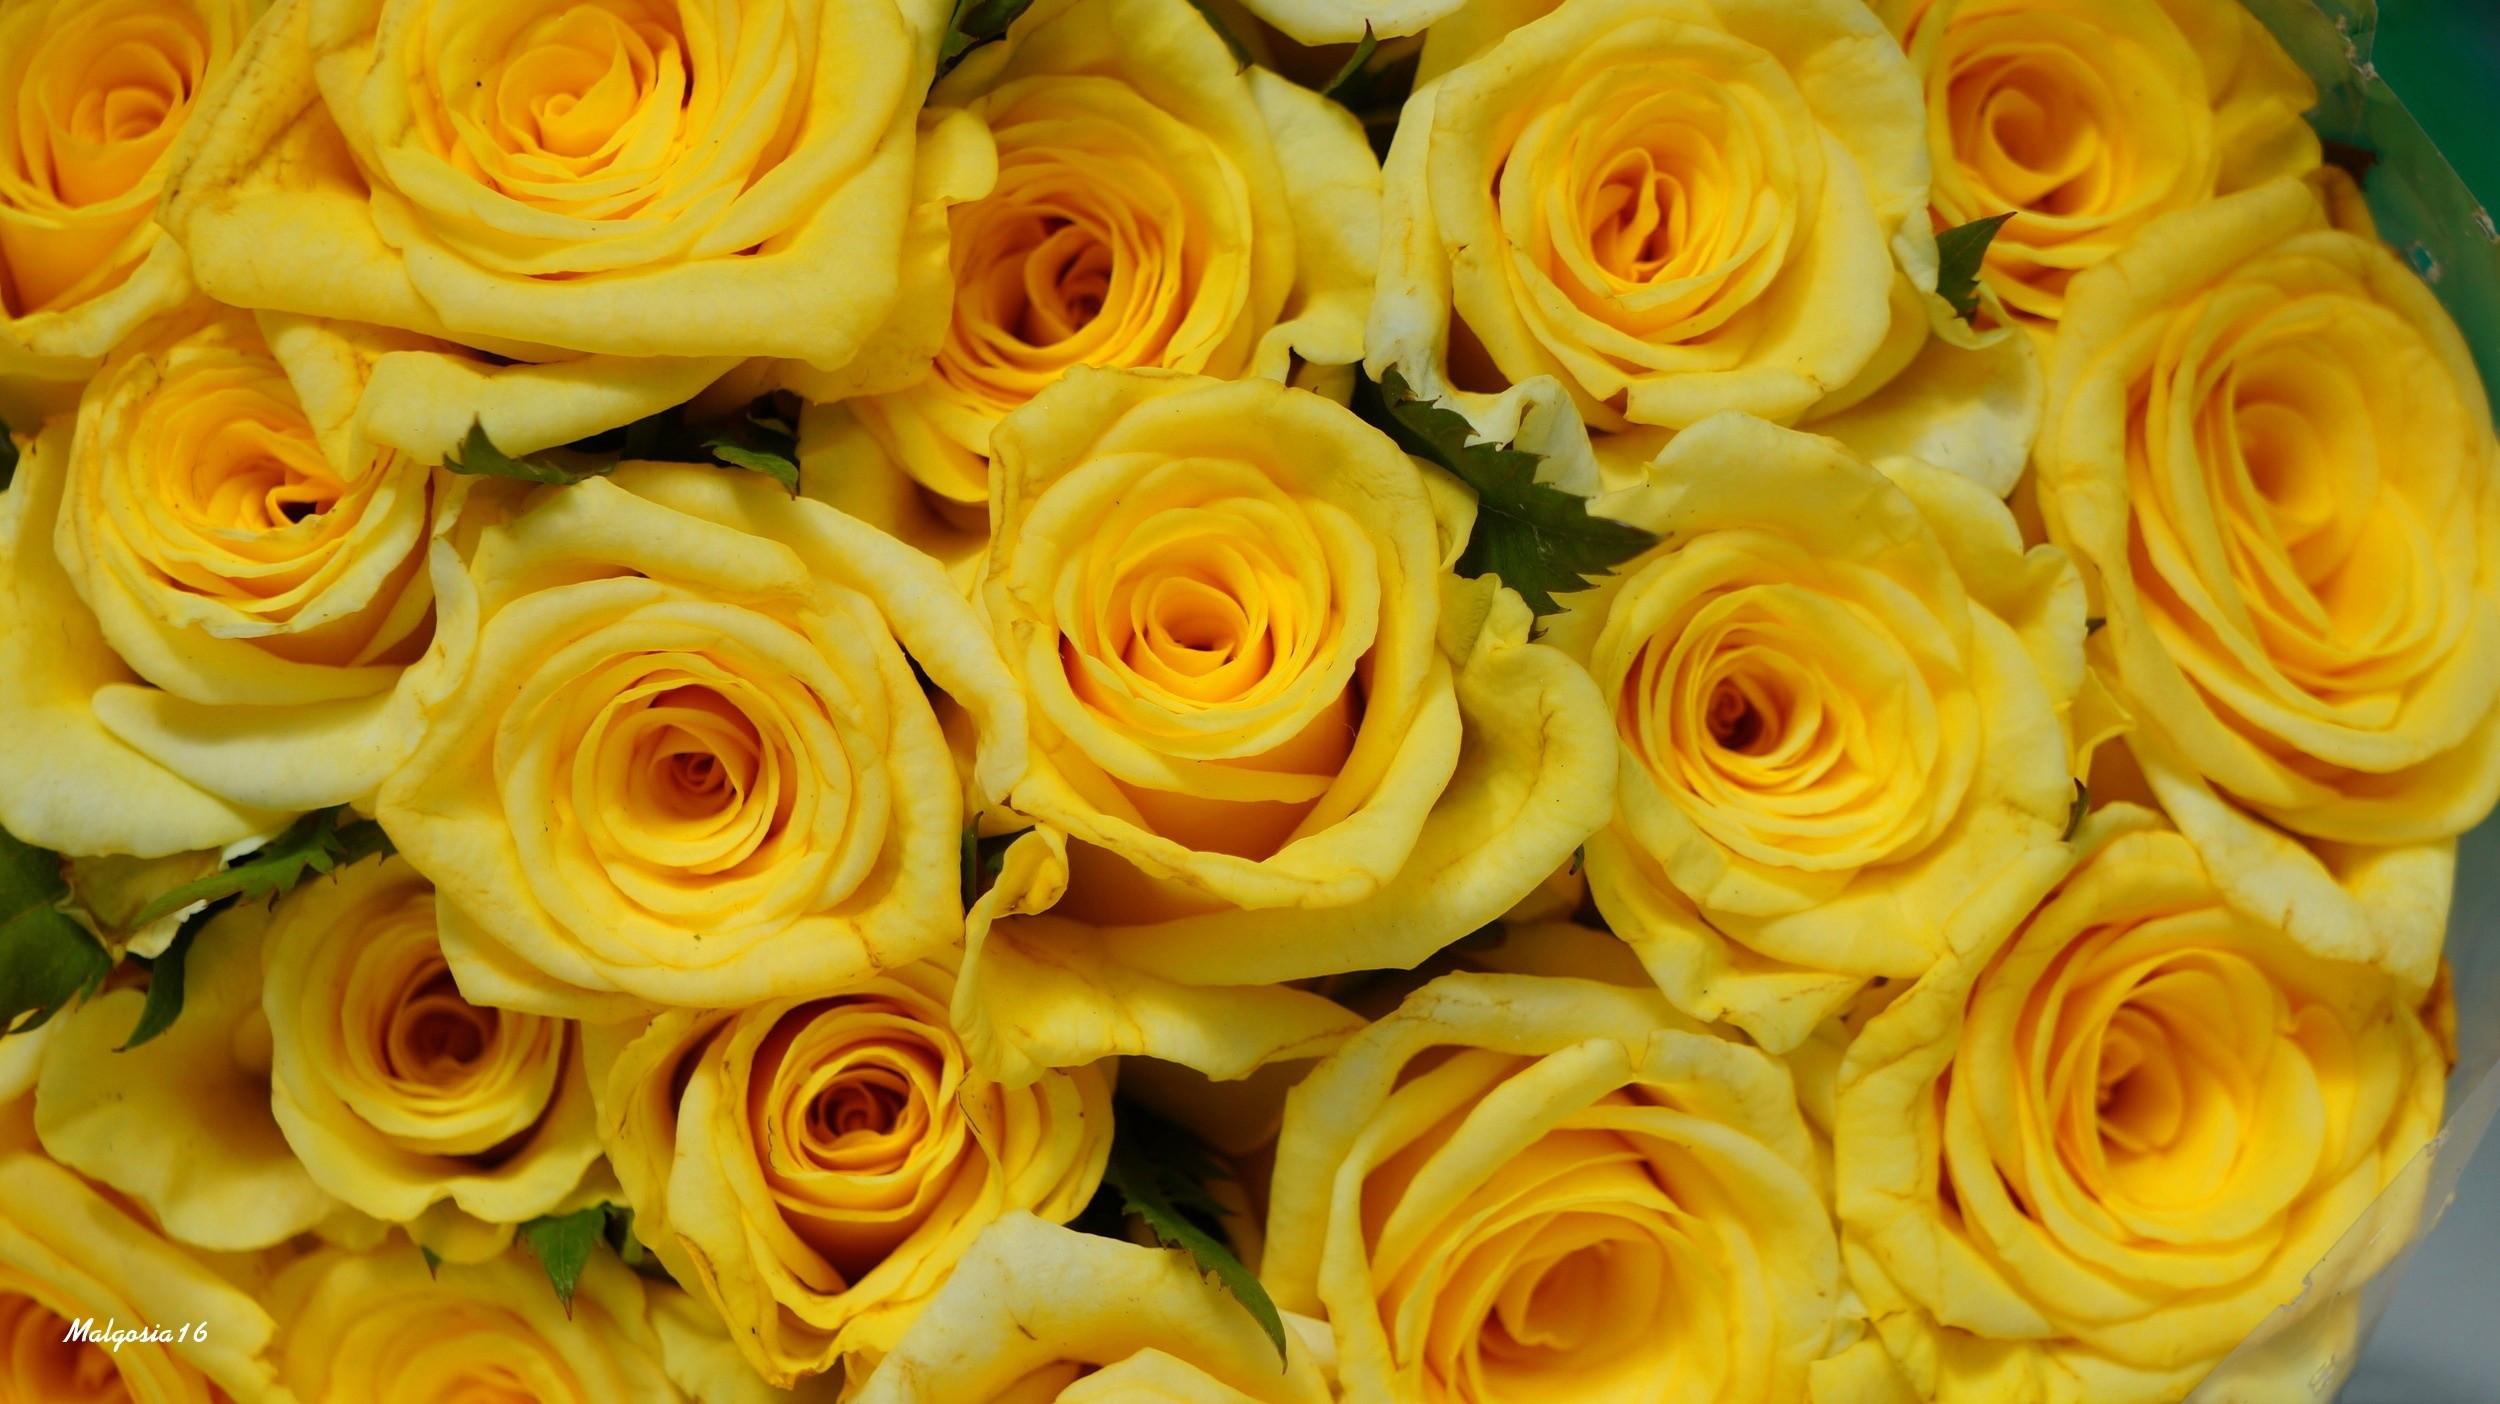 Yellow Roses HD Wallpaper 2880x1800